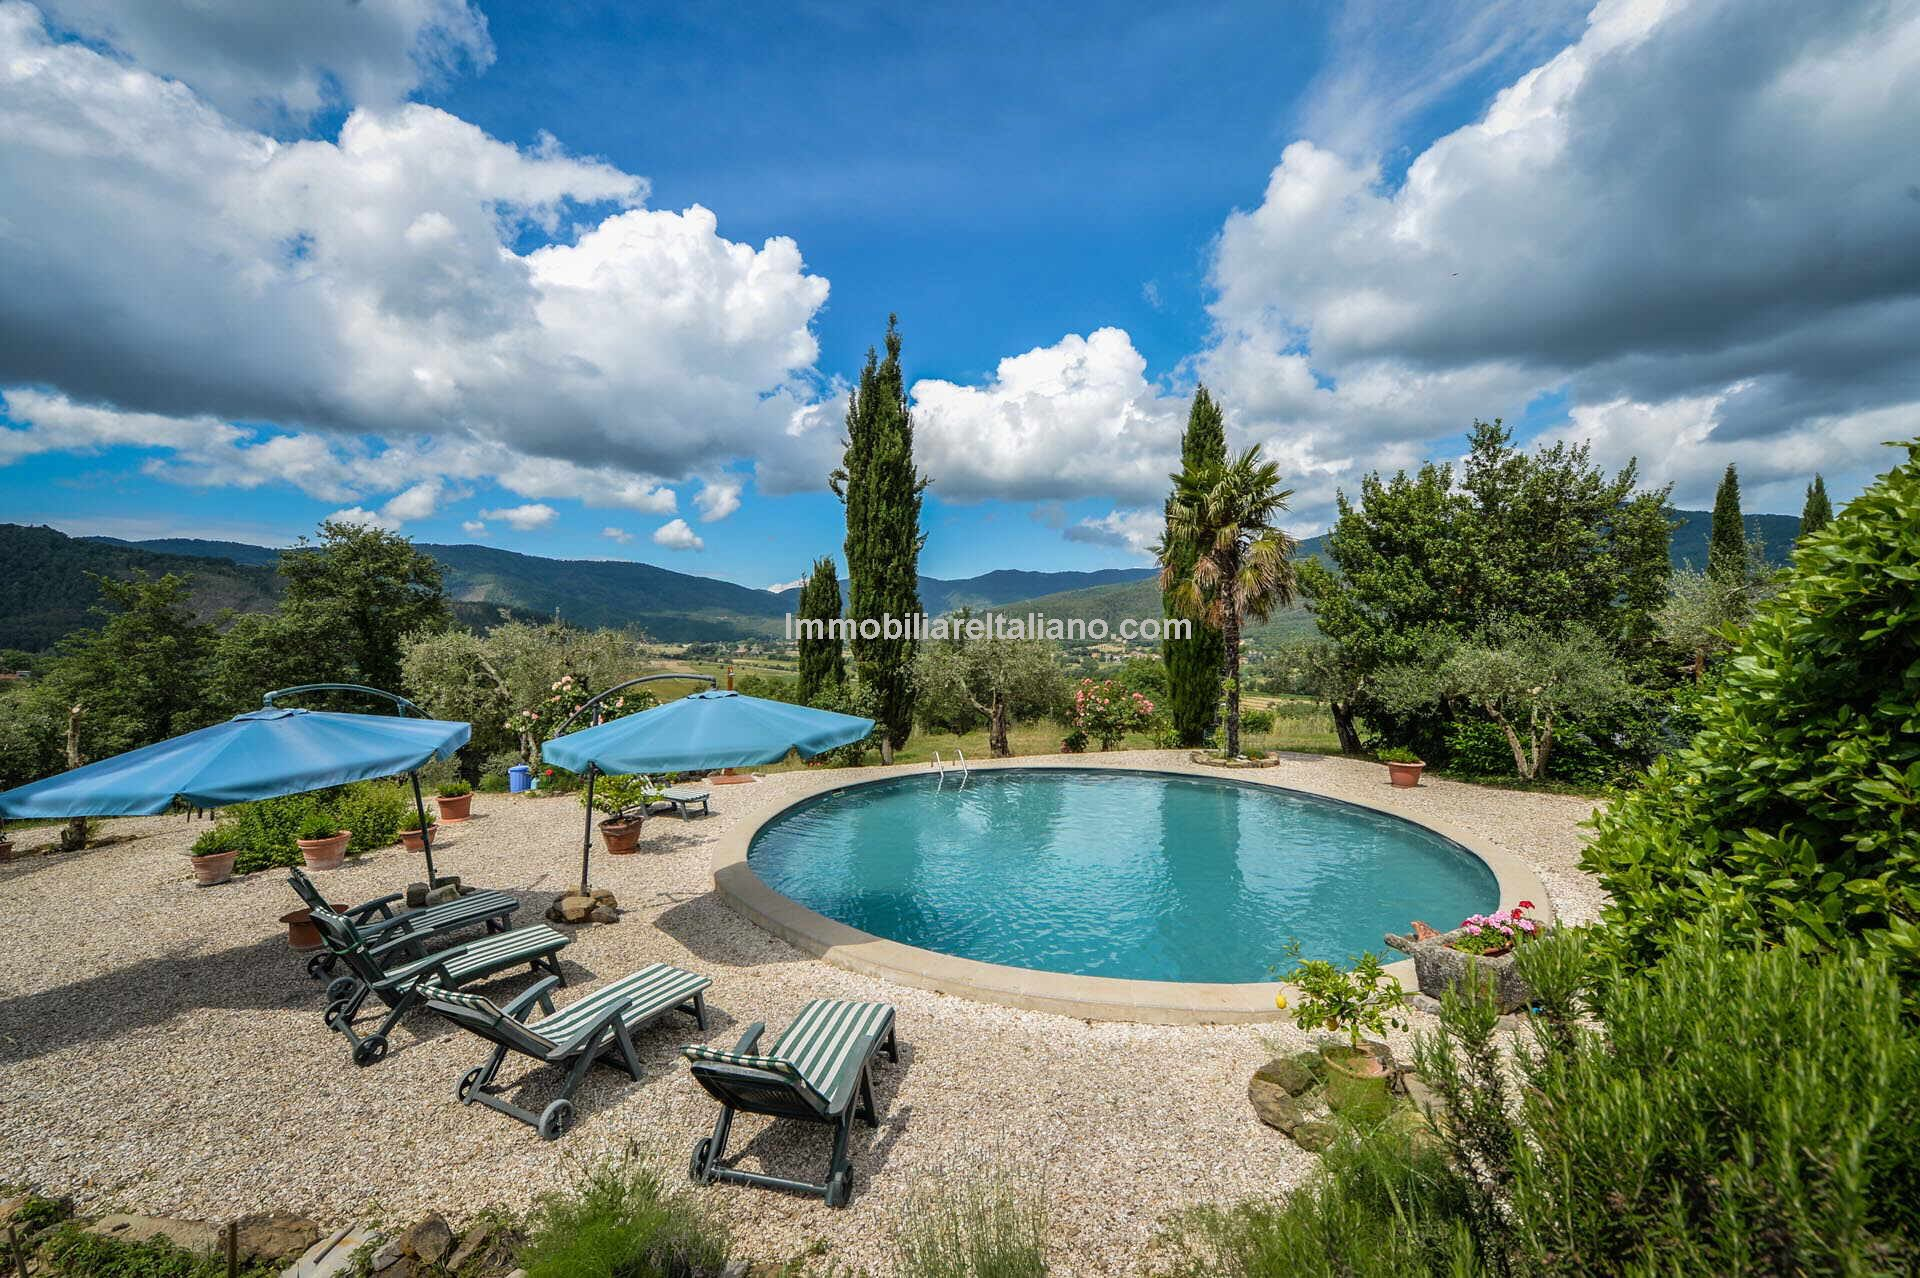 Italian farmhouse with garden and pool